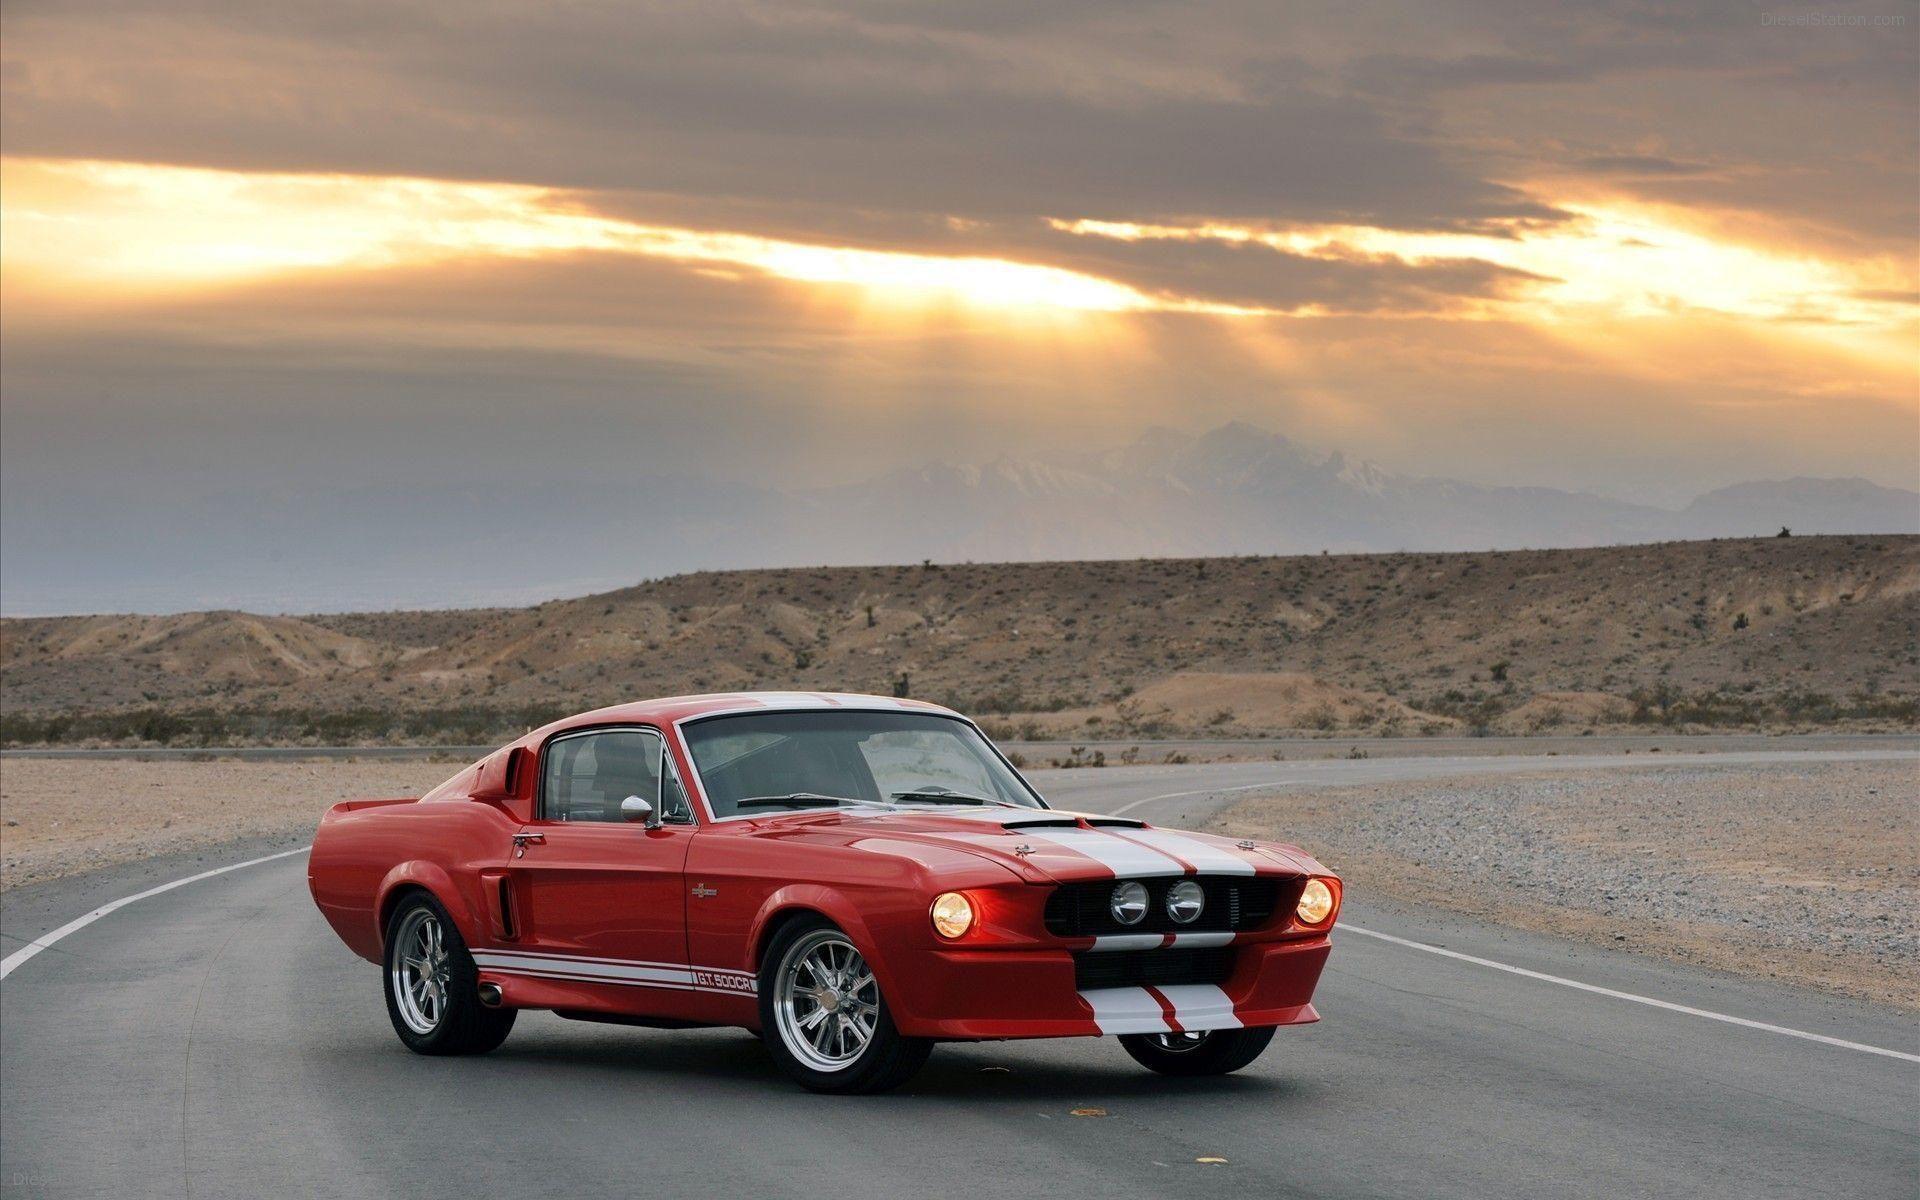 1967 Mustang Wallpapers Wallpaper Cave Classic cars